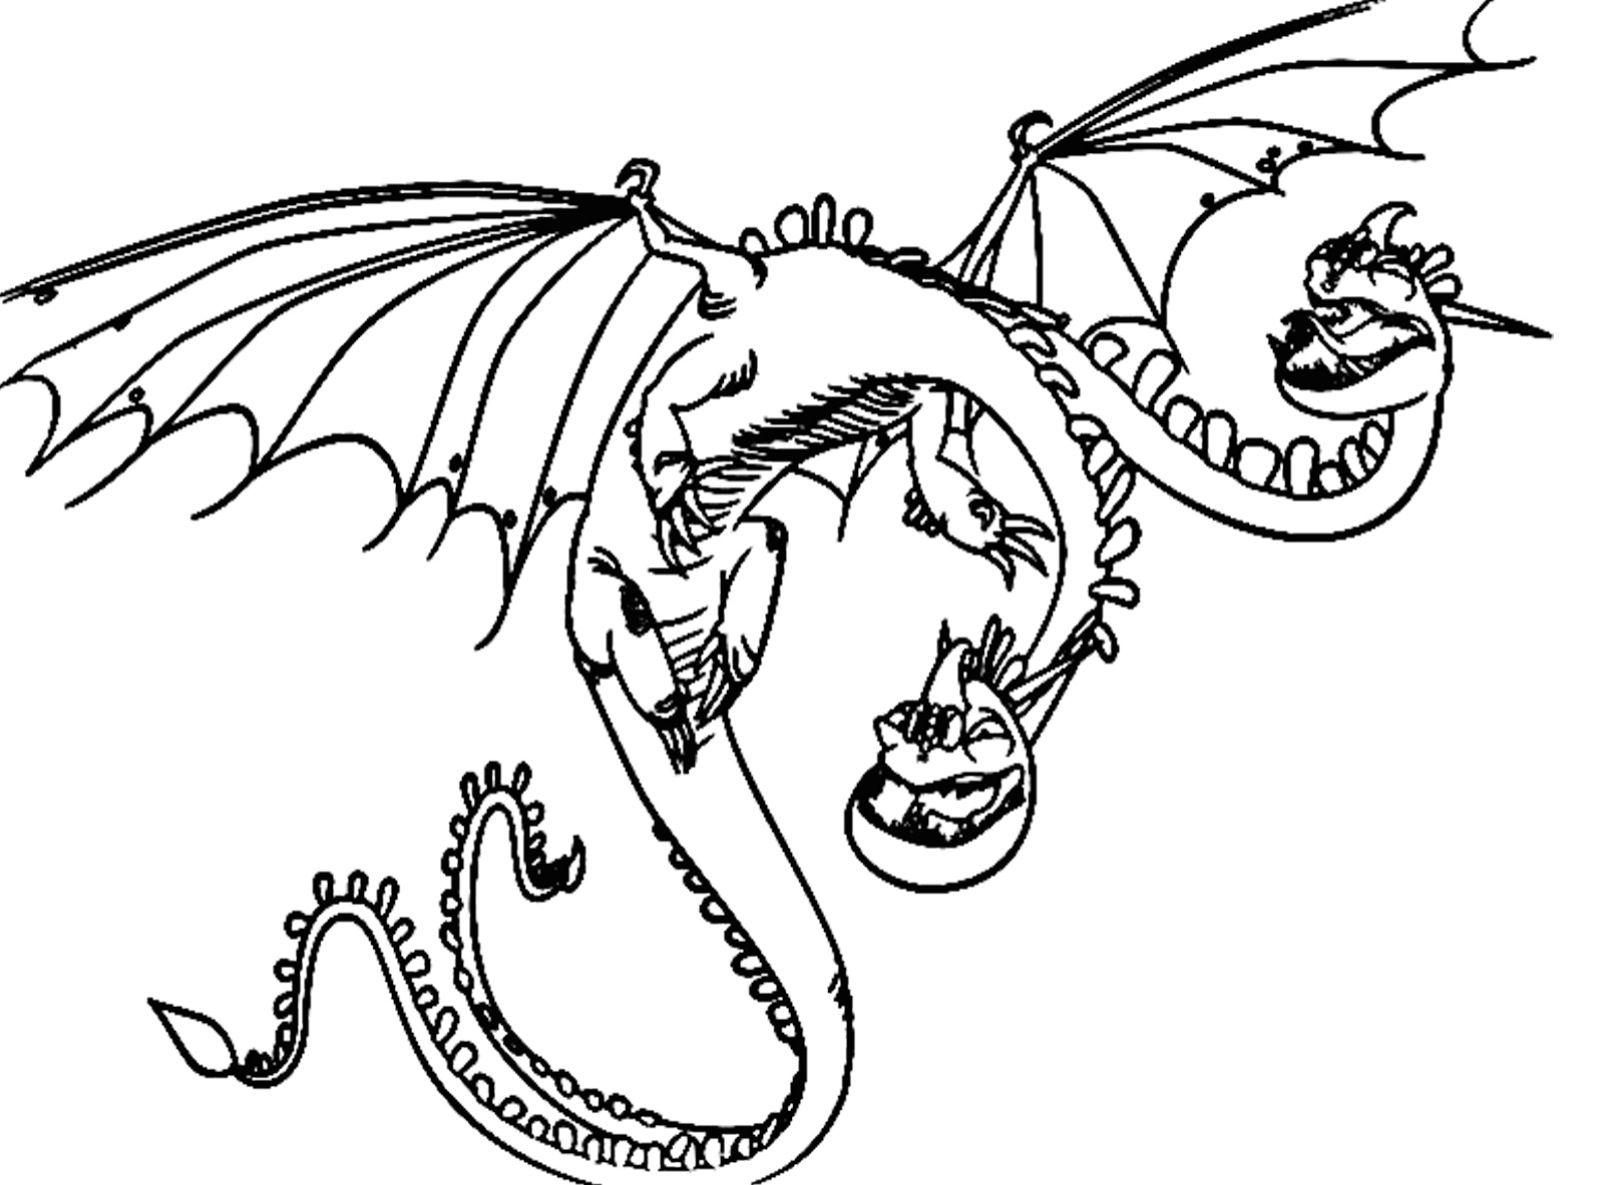 hideous zippleback drawings u003ctaking requests u003e of dragons